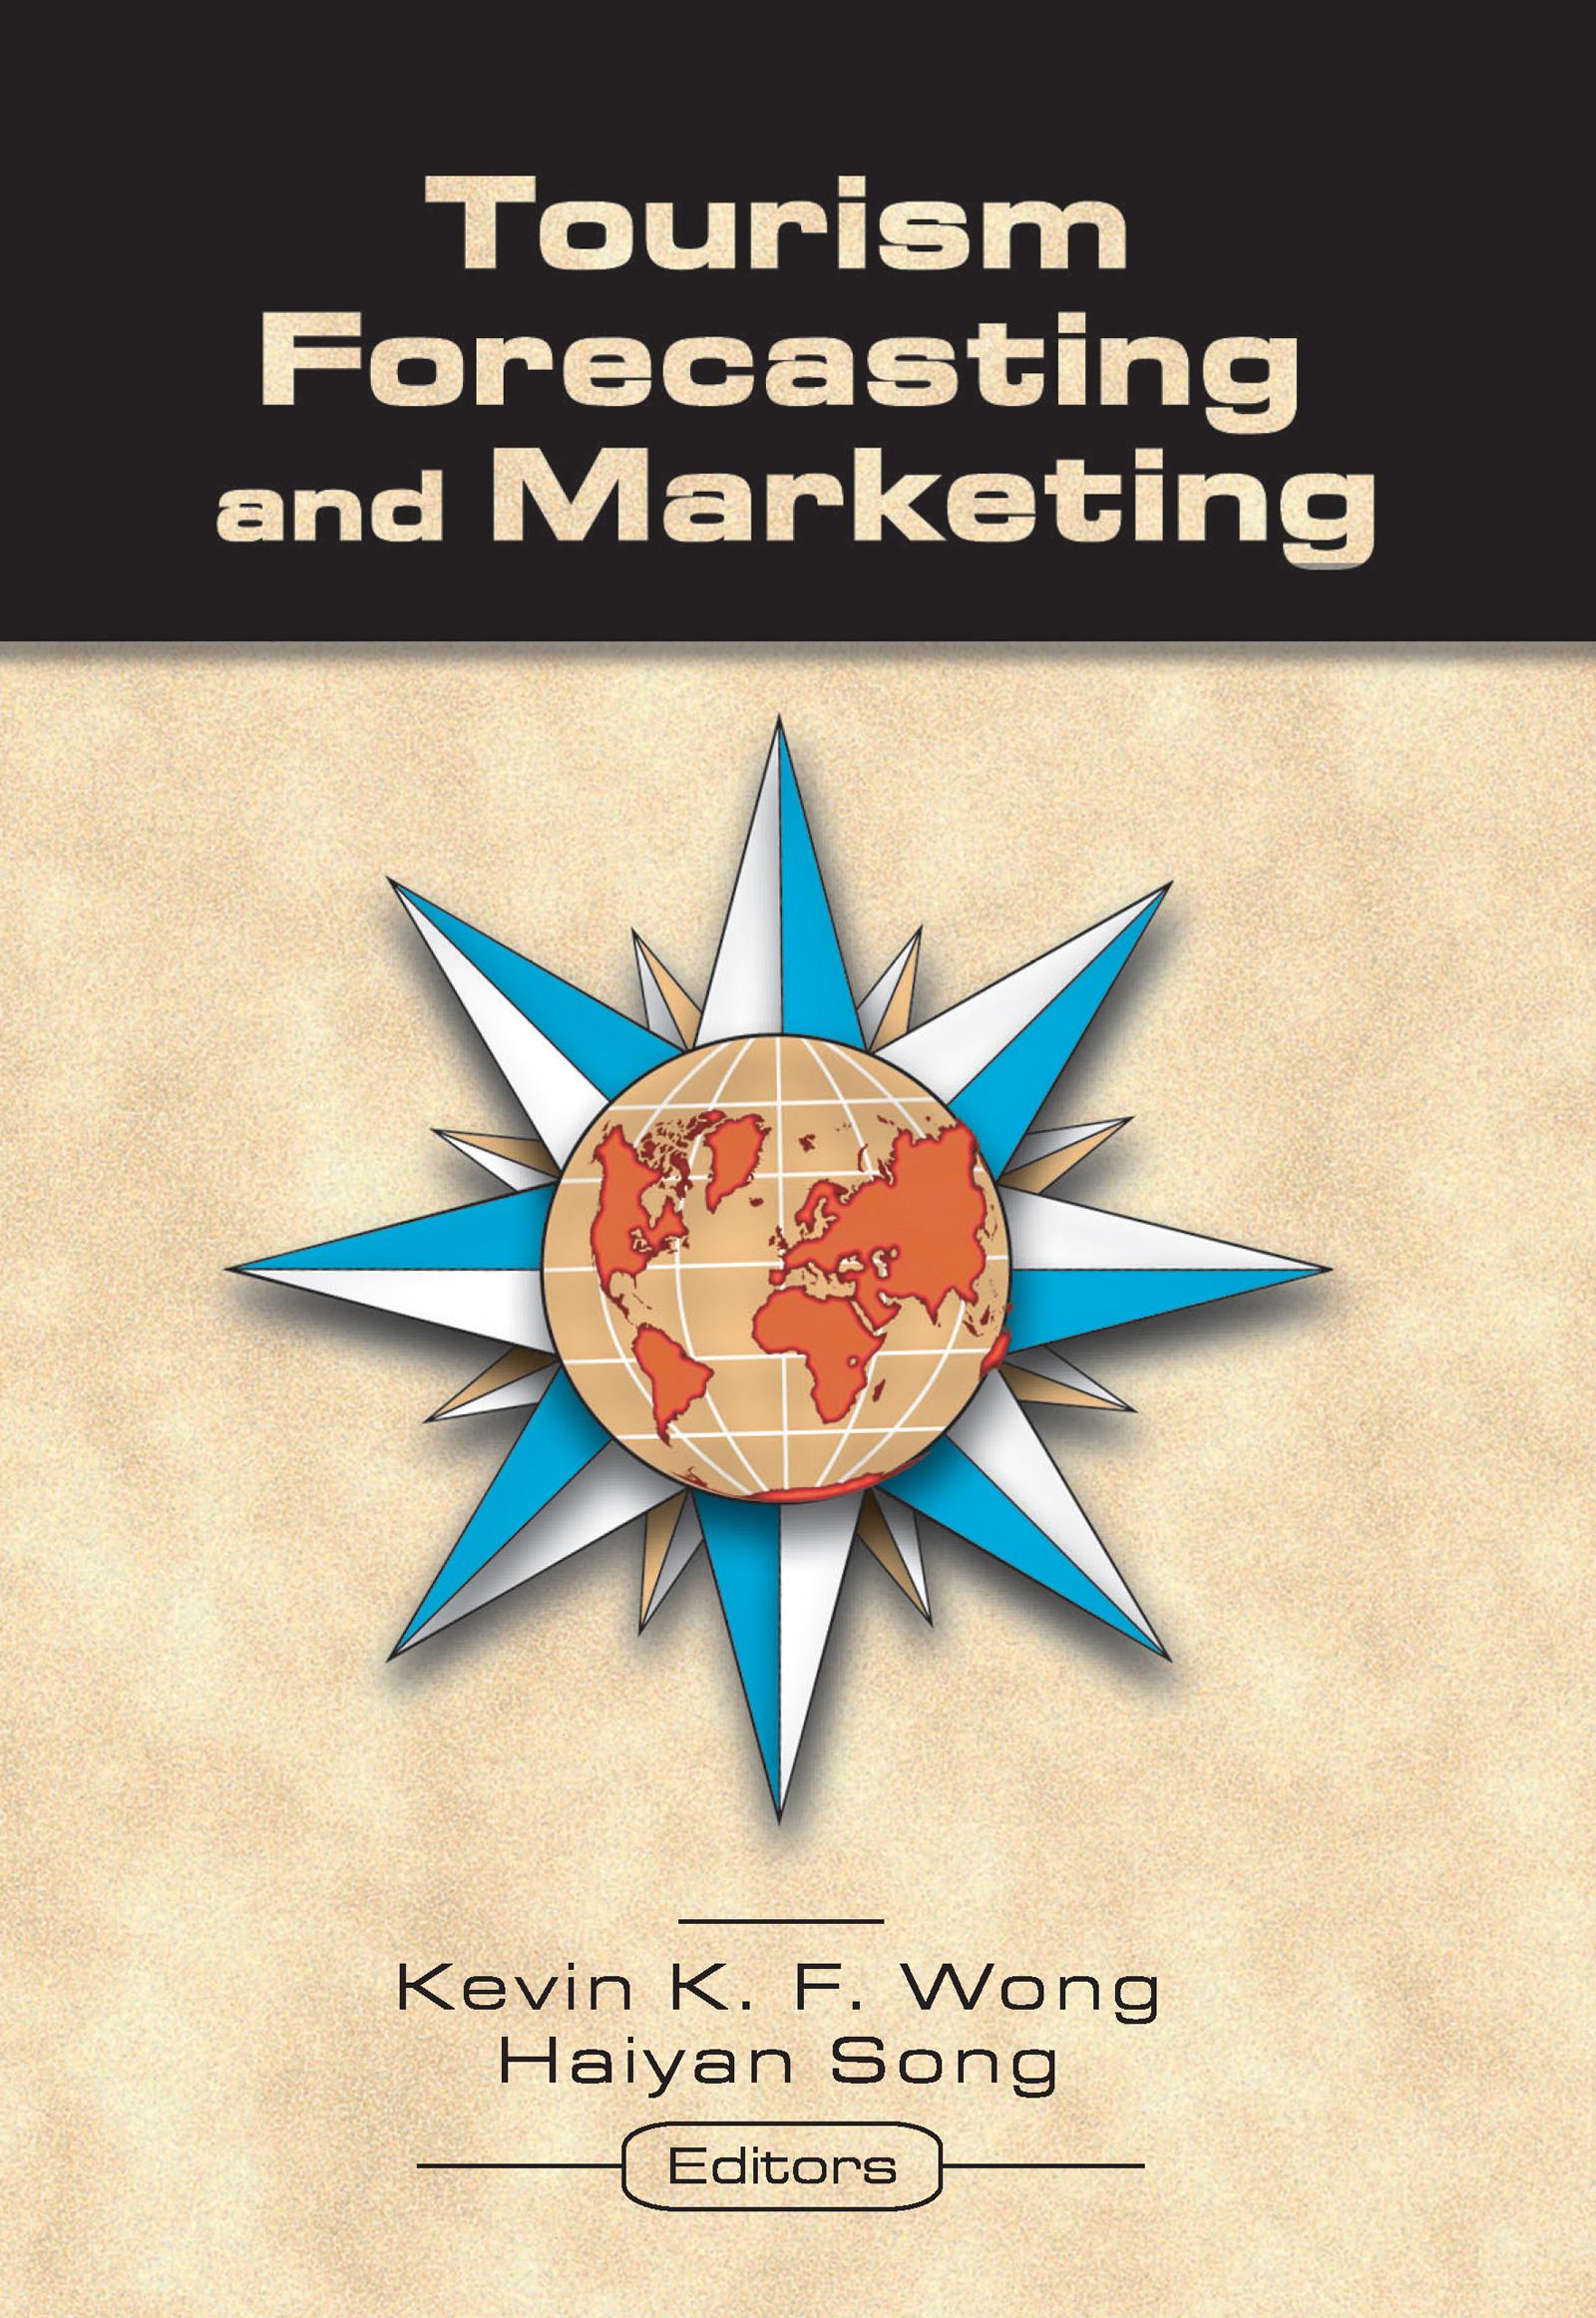 Tourism Forecasting and Marketing (Paperback) book cover